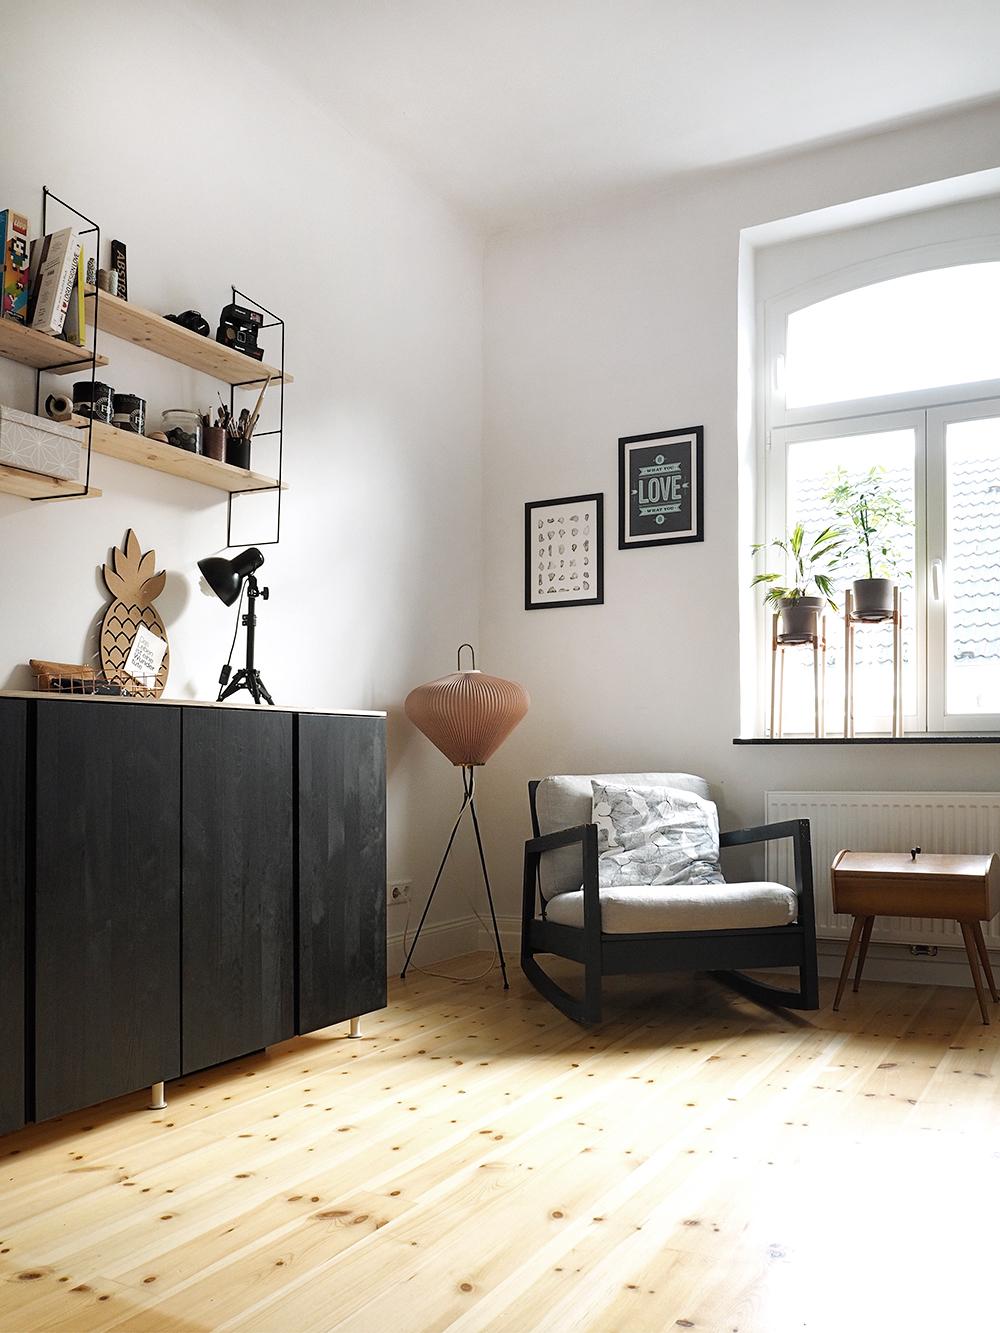 Ikea Hack - vom Ivar Schrank zum coolen Sideboard - www.craftifair.de